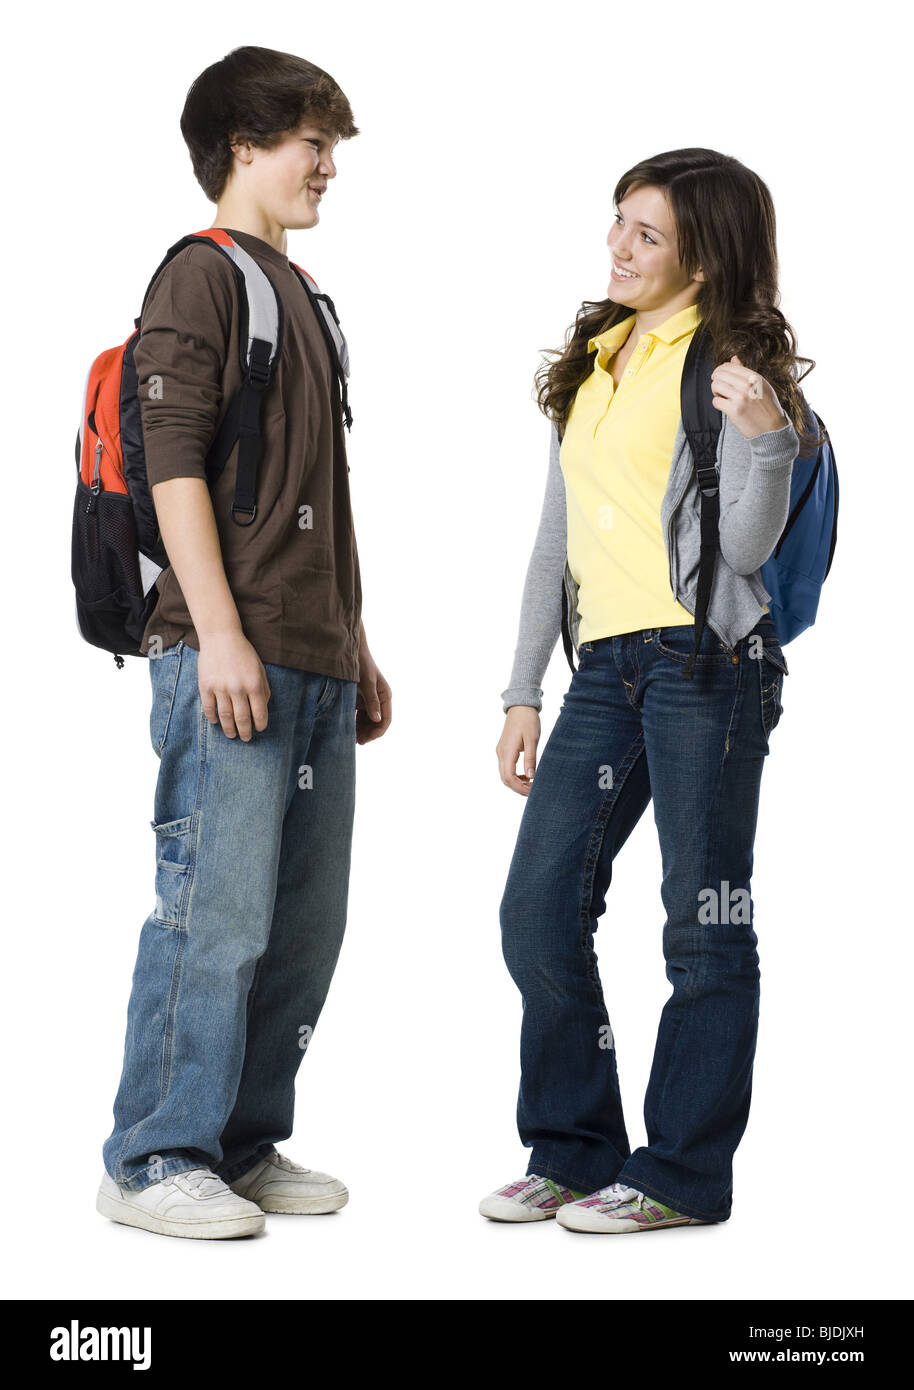 Les étudiants avec sac posing Photo Stock